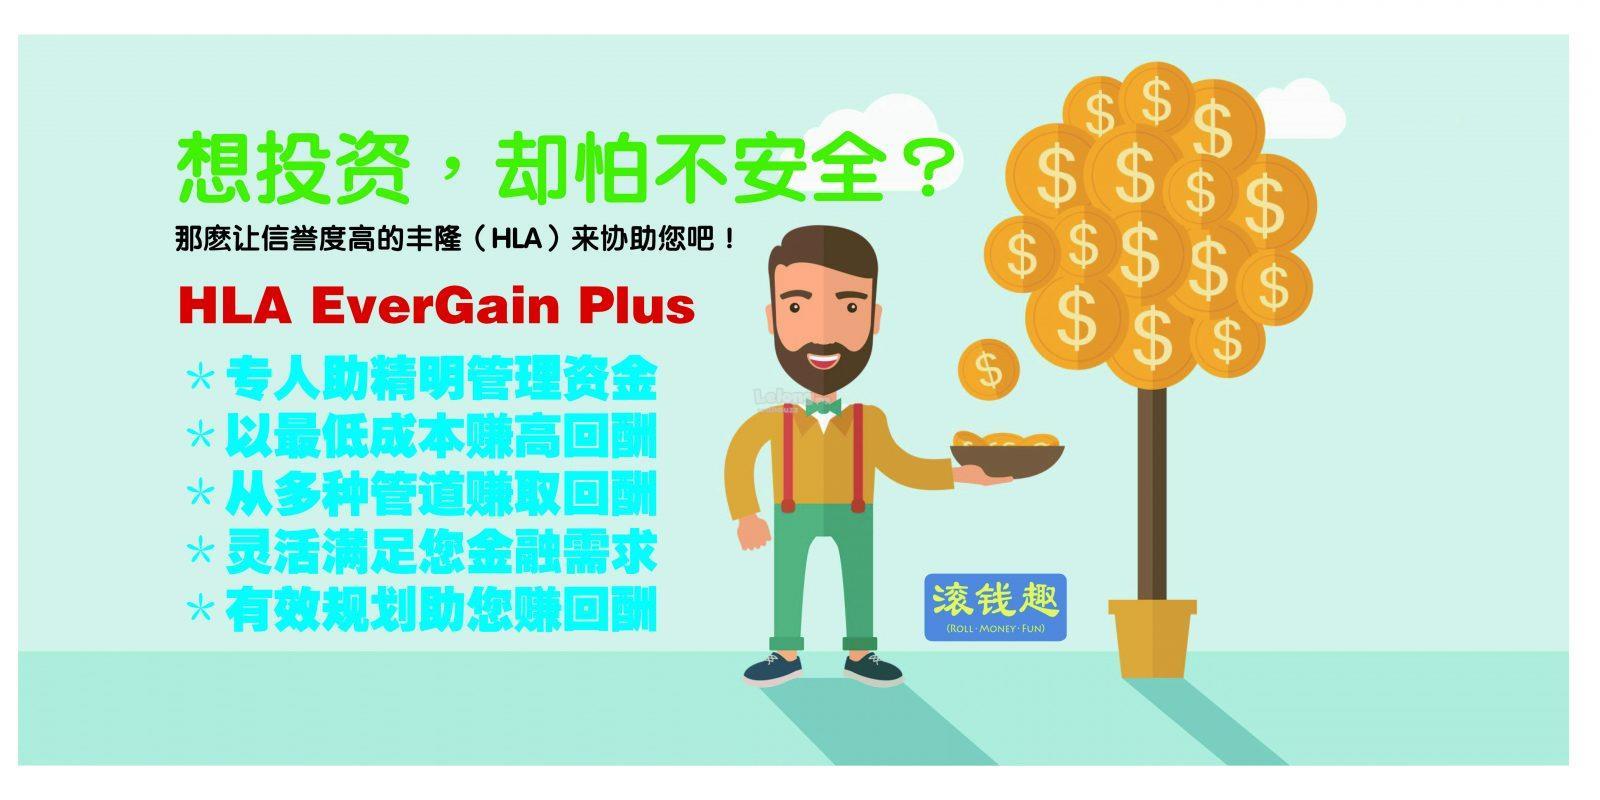 financial planner saving rm 3 00 per end 6 2 2019 12 15 am